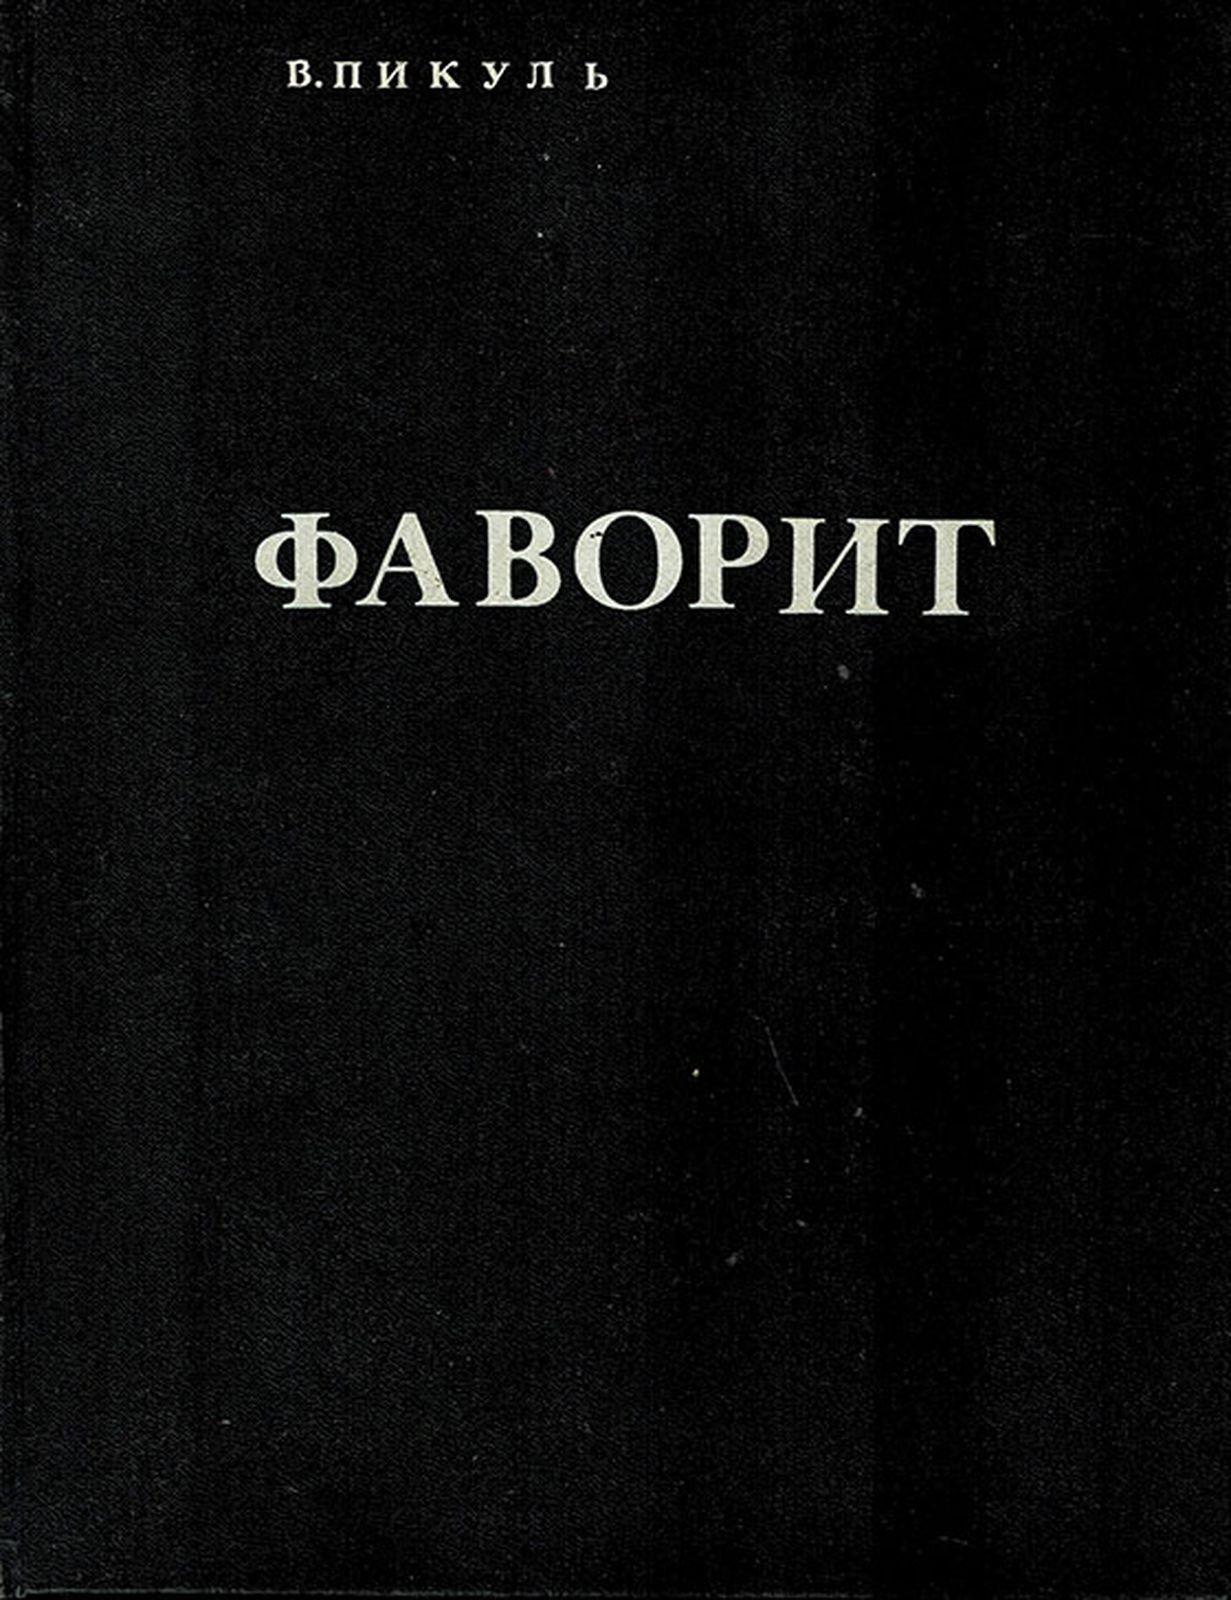 Пикуль В. Фаворит. Роман-газета. №9-10, 1987, №13-14, 1988. (Конволют)